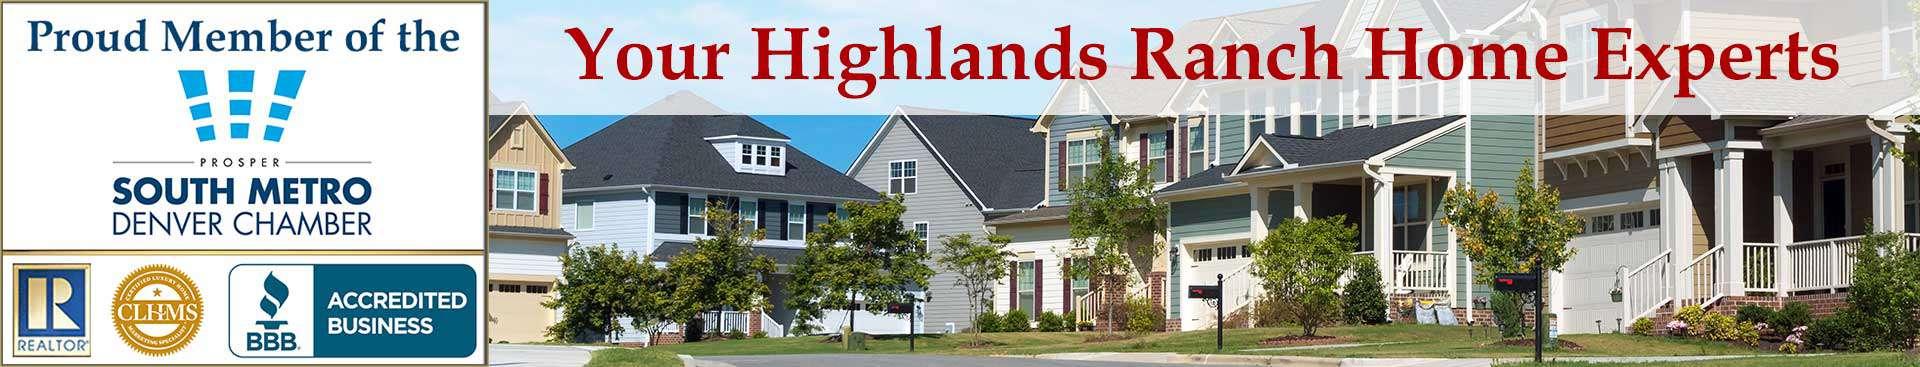 Highlands Ranch CO Organizational Banner